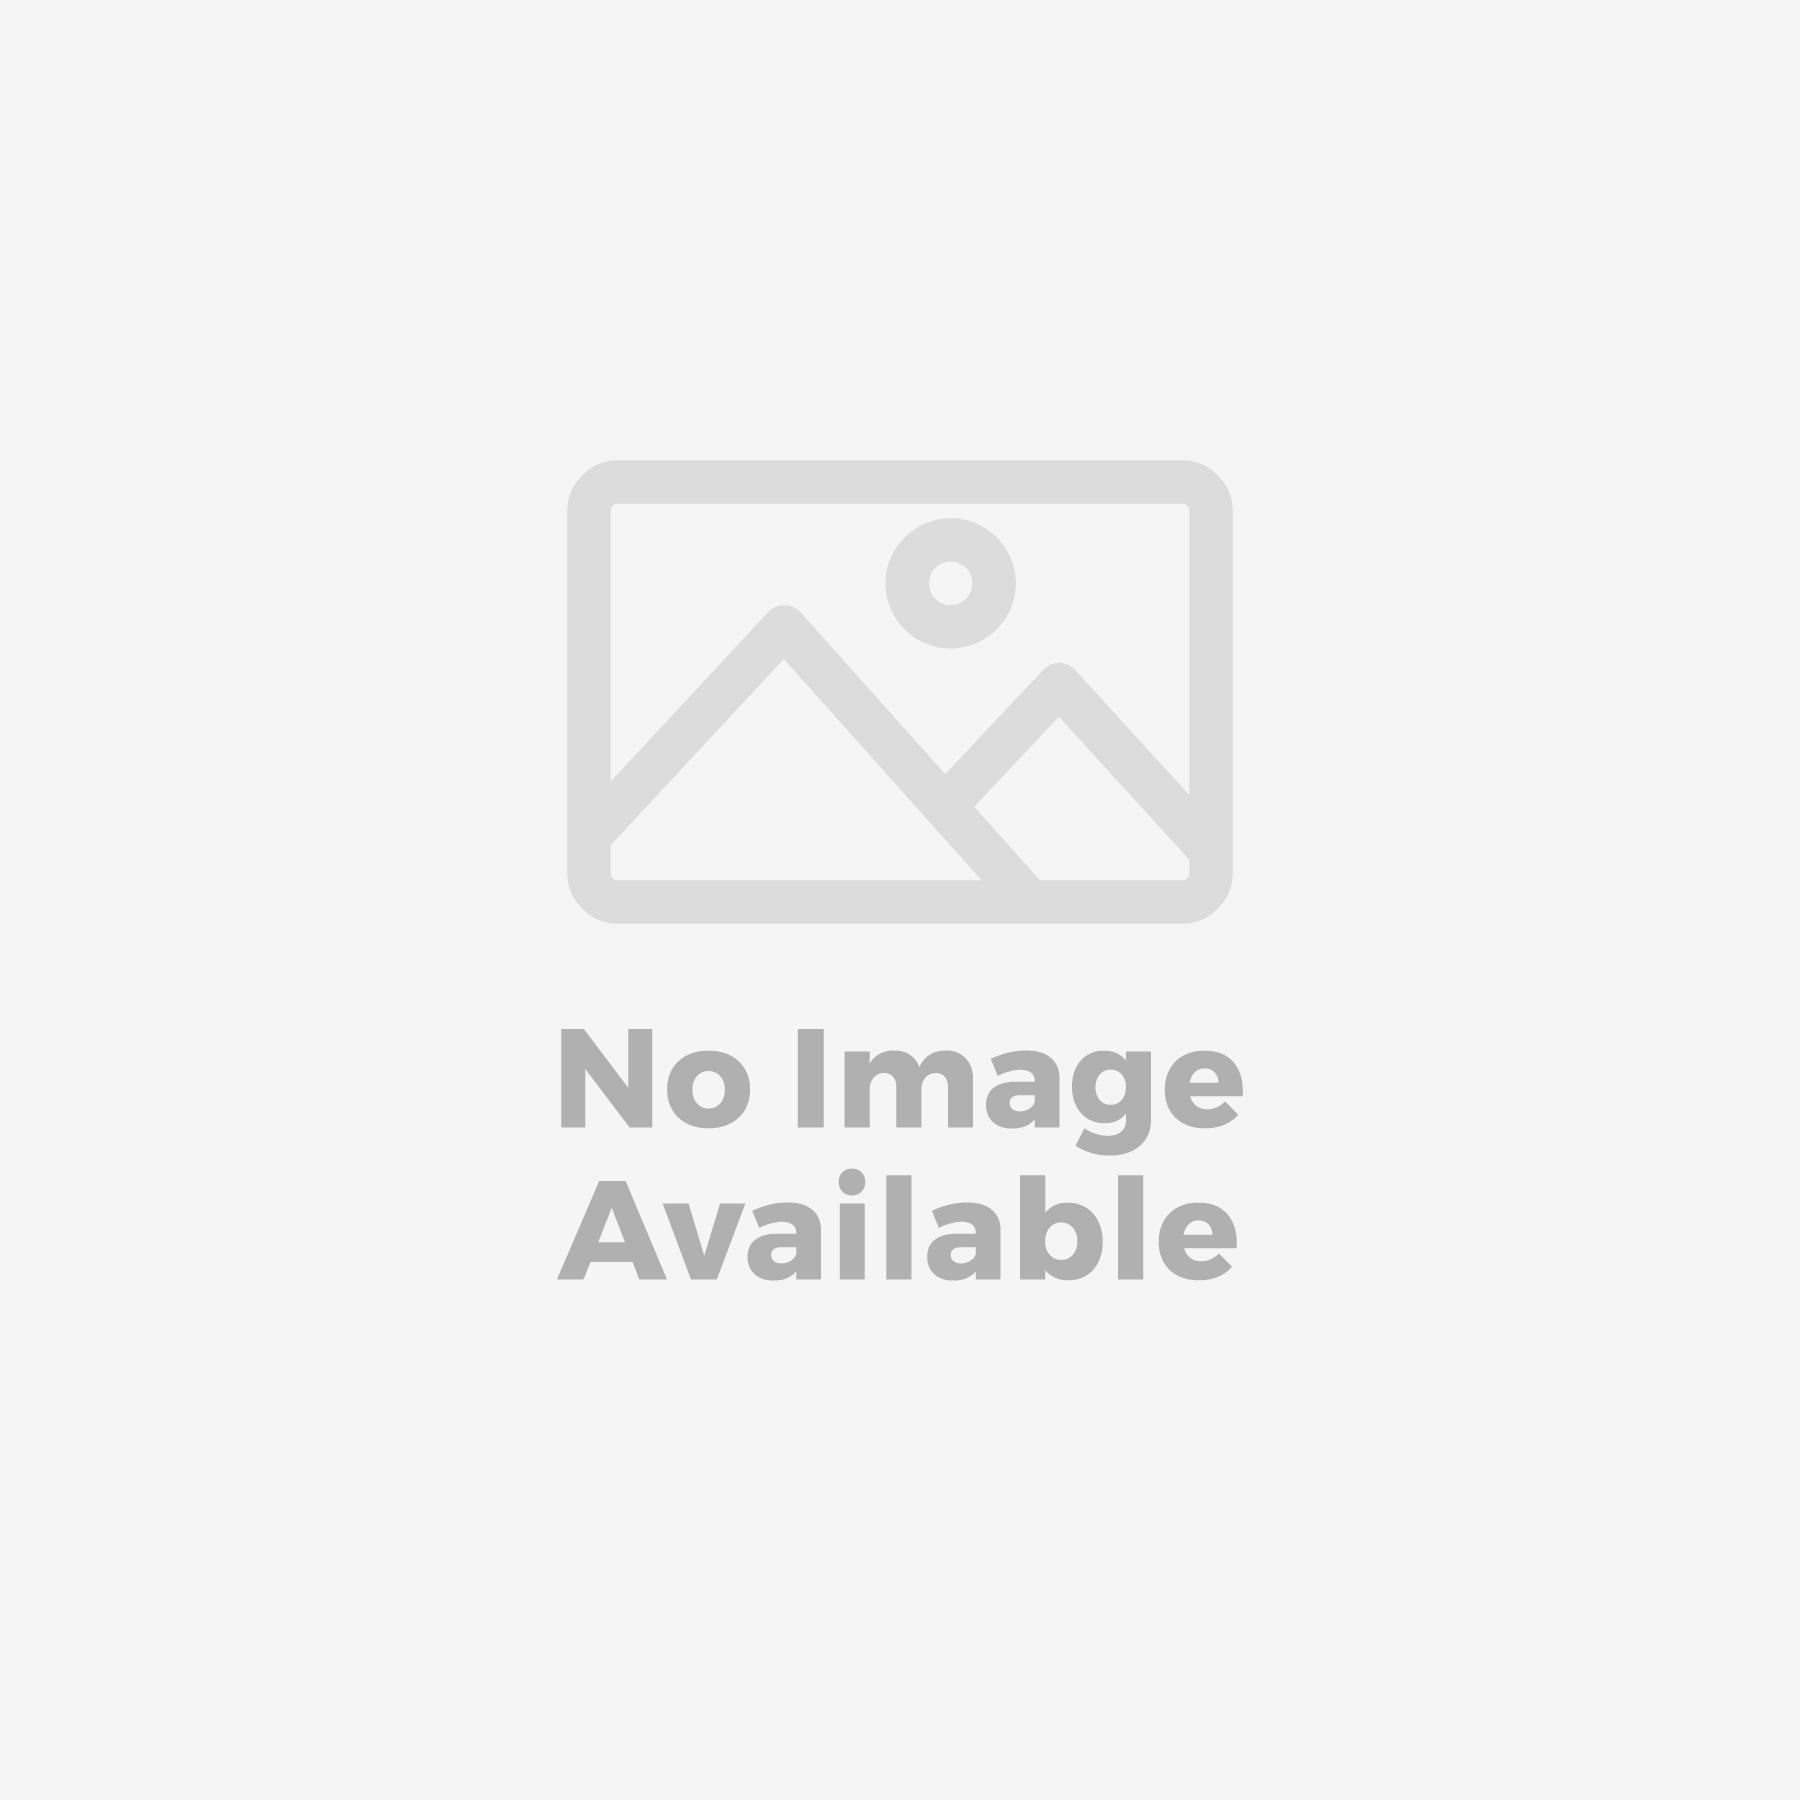 MISTRAL 2-Seater Sofa